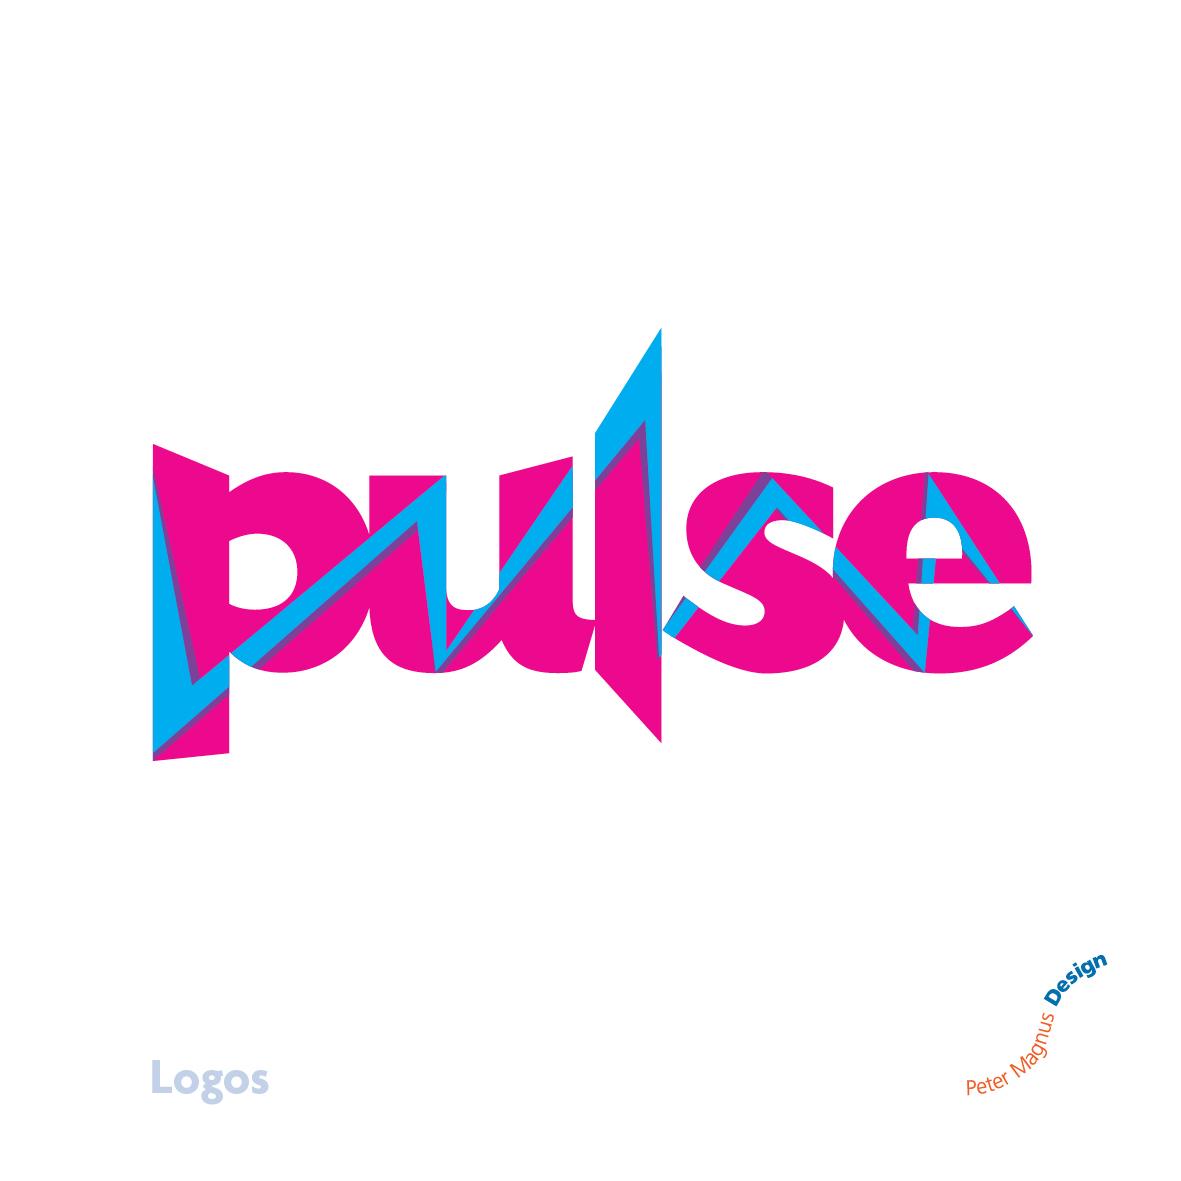 Pulse youth club logo, Bushey Baptist Church, Herts